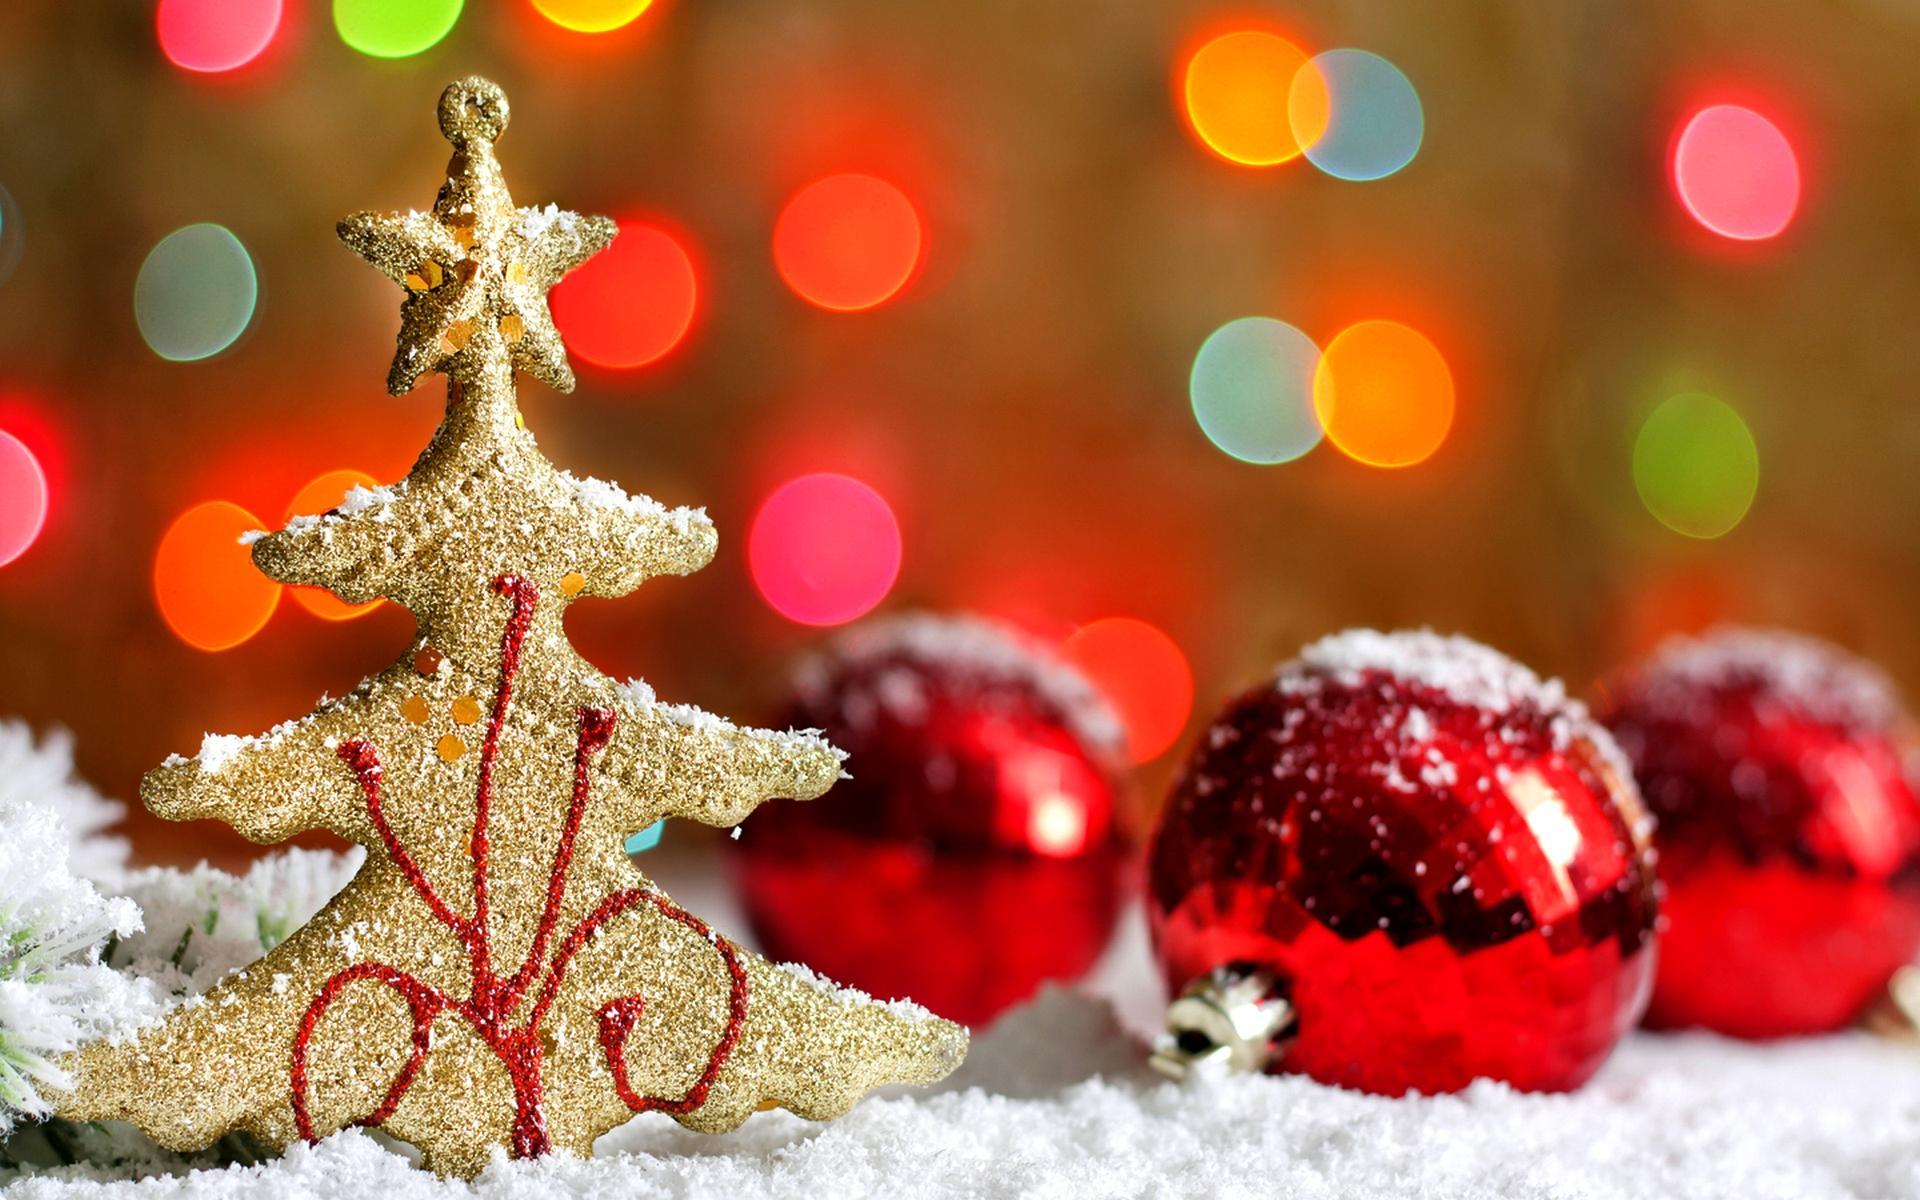 Download Holiday HD Wallpapers Free | PixelsTalk.Net